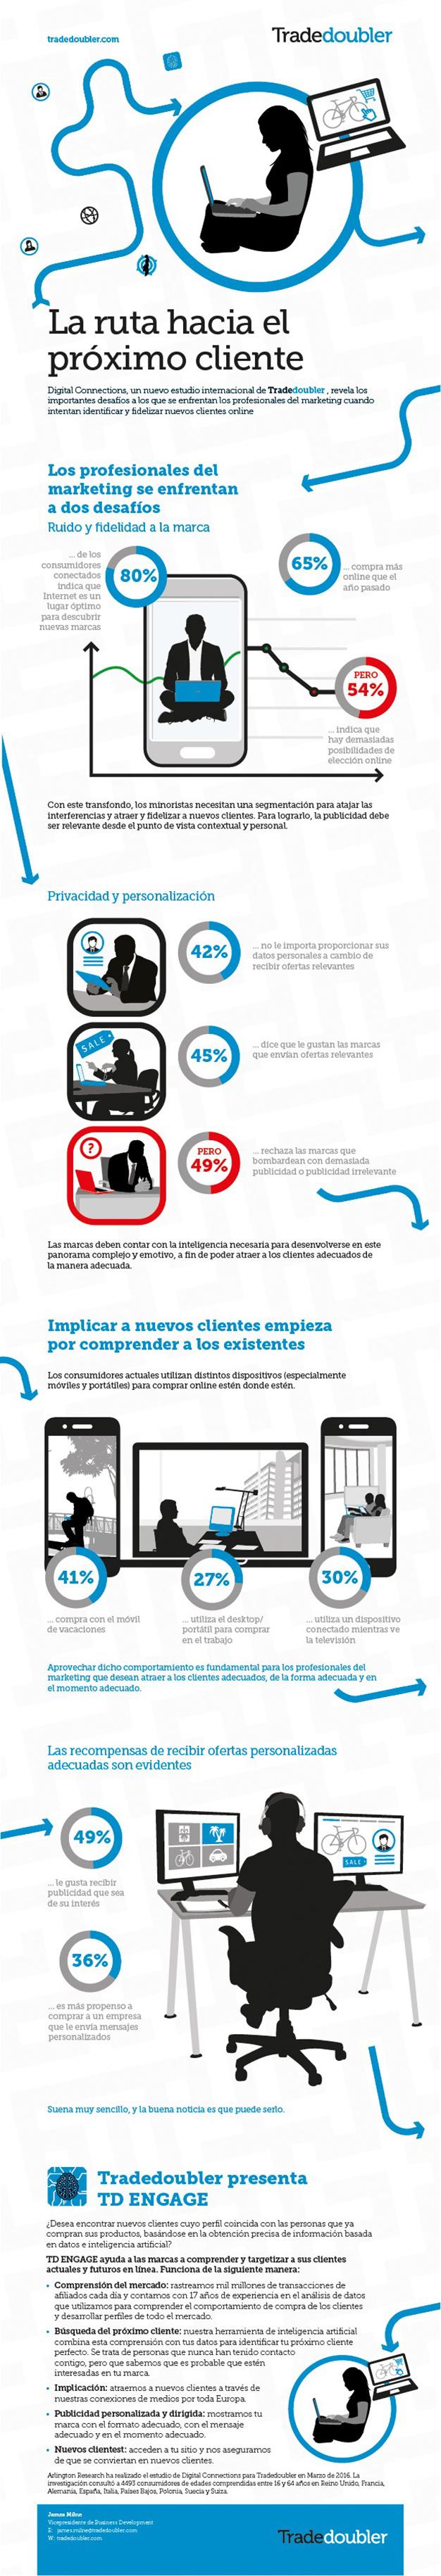 122 TD RTYNC Infographic_ES